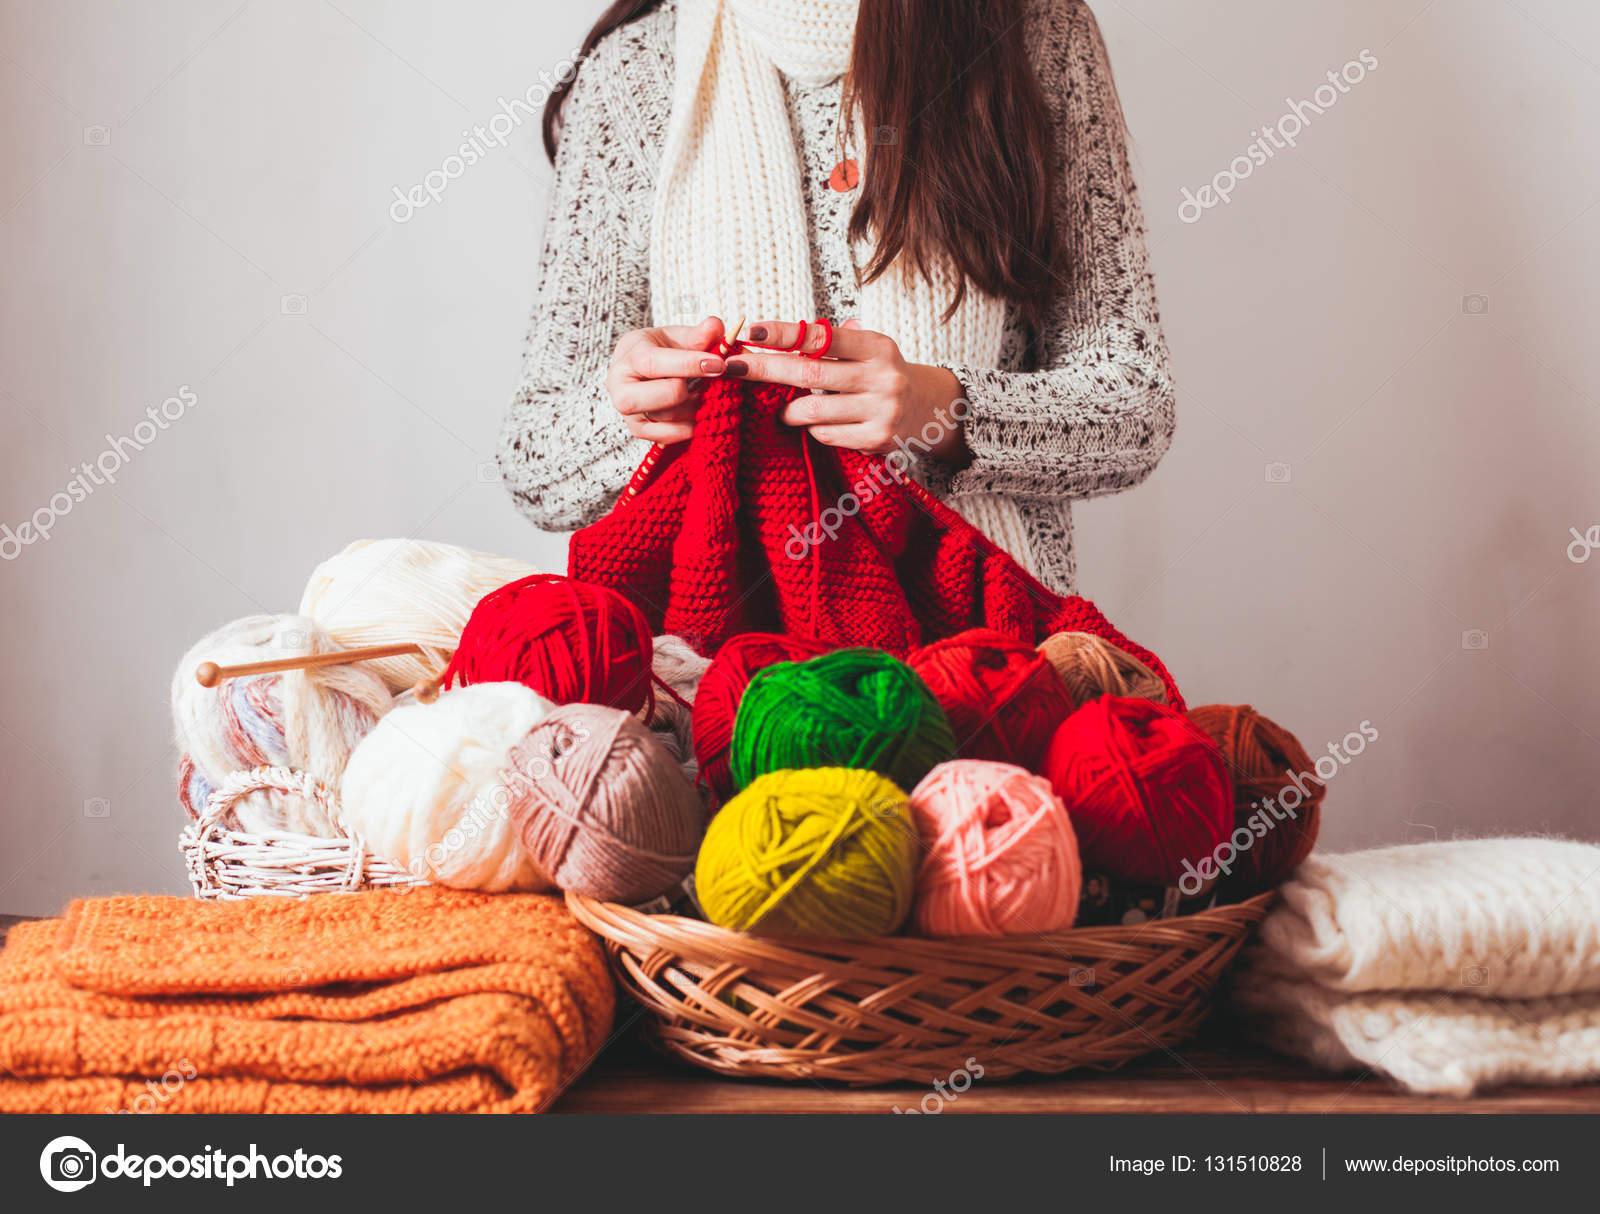 a70734e4a1f Γυναικεία πλεκτά πουλόβερ — Φωτογραφία Αρχείου © oksixx #131510828